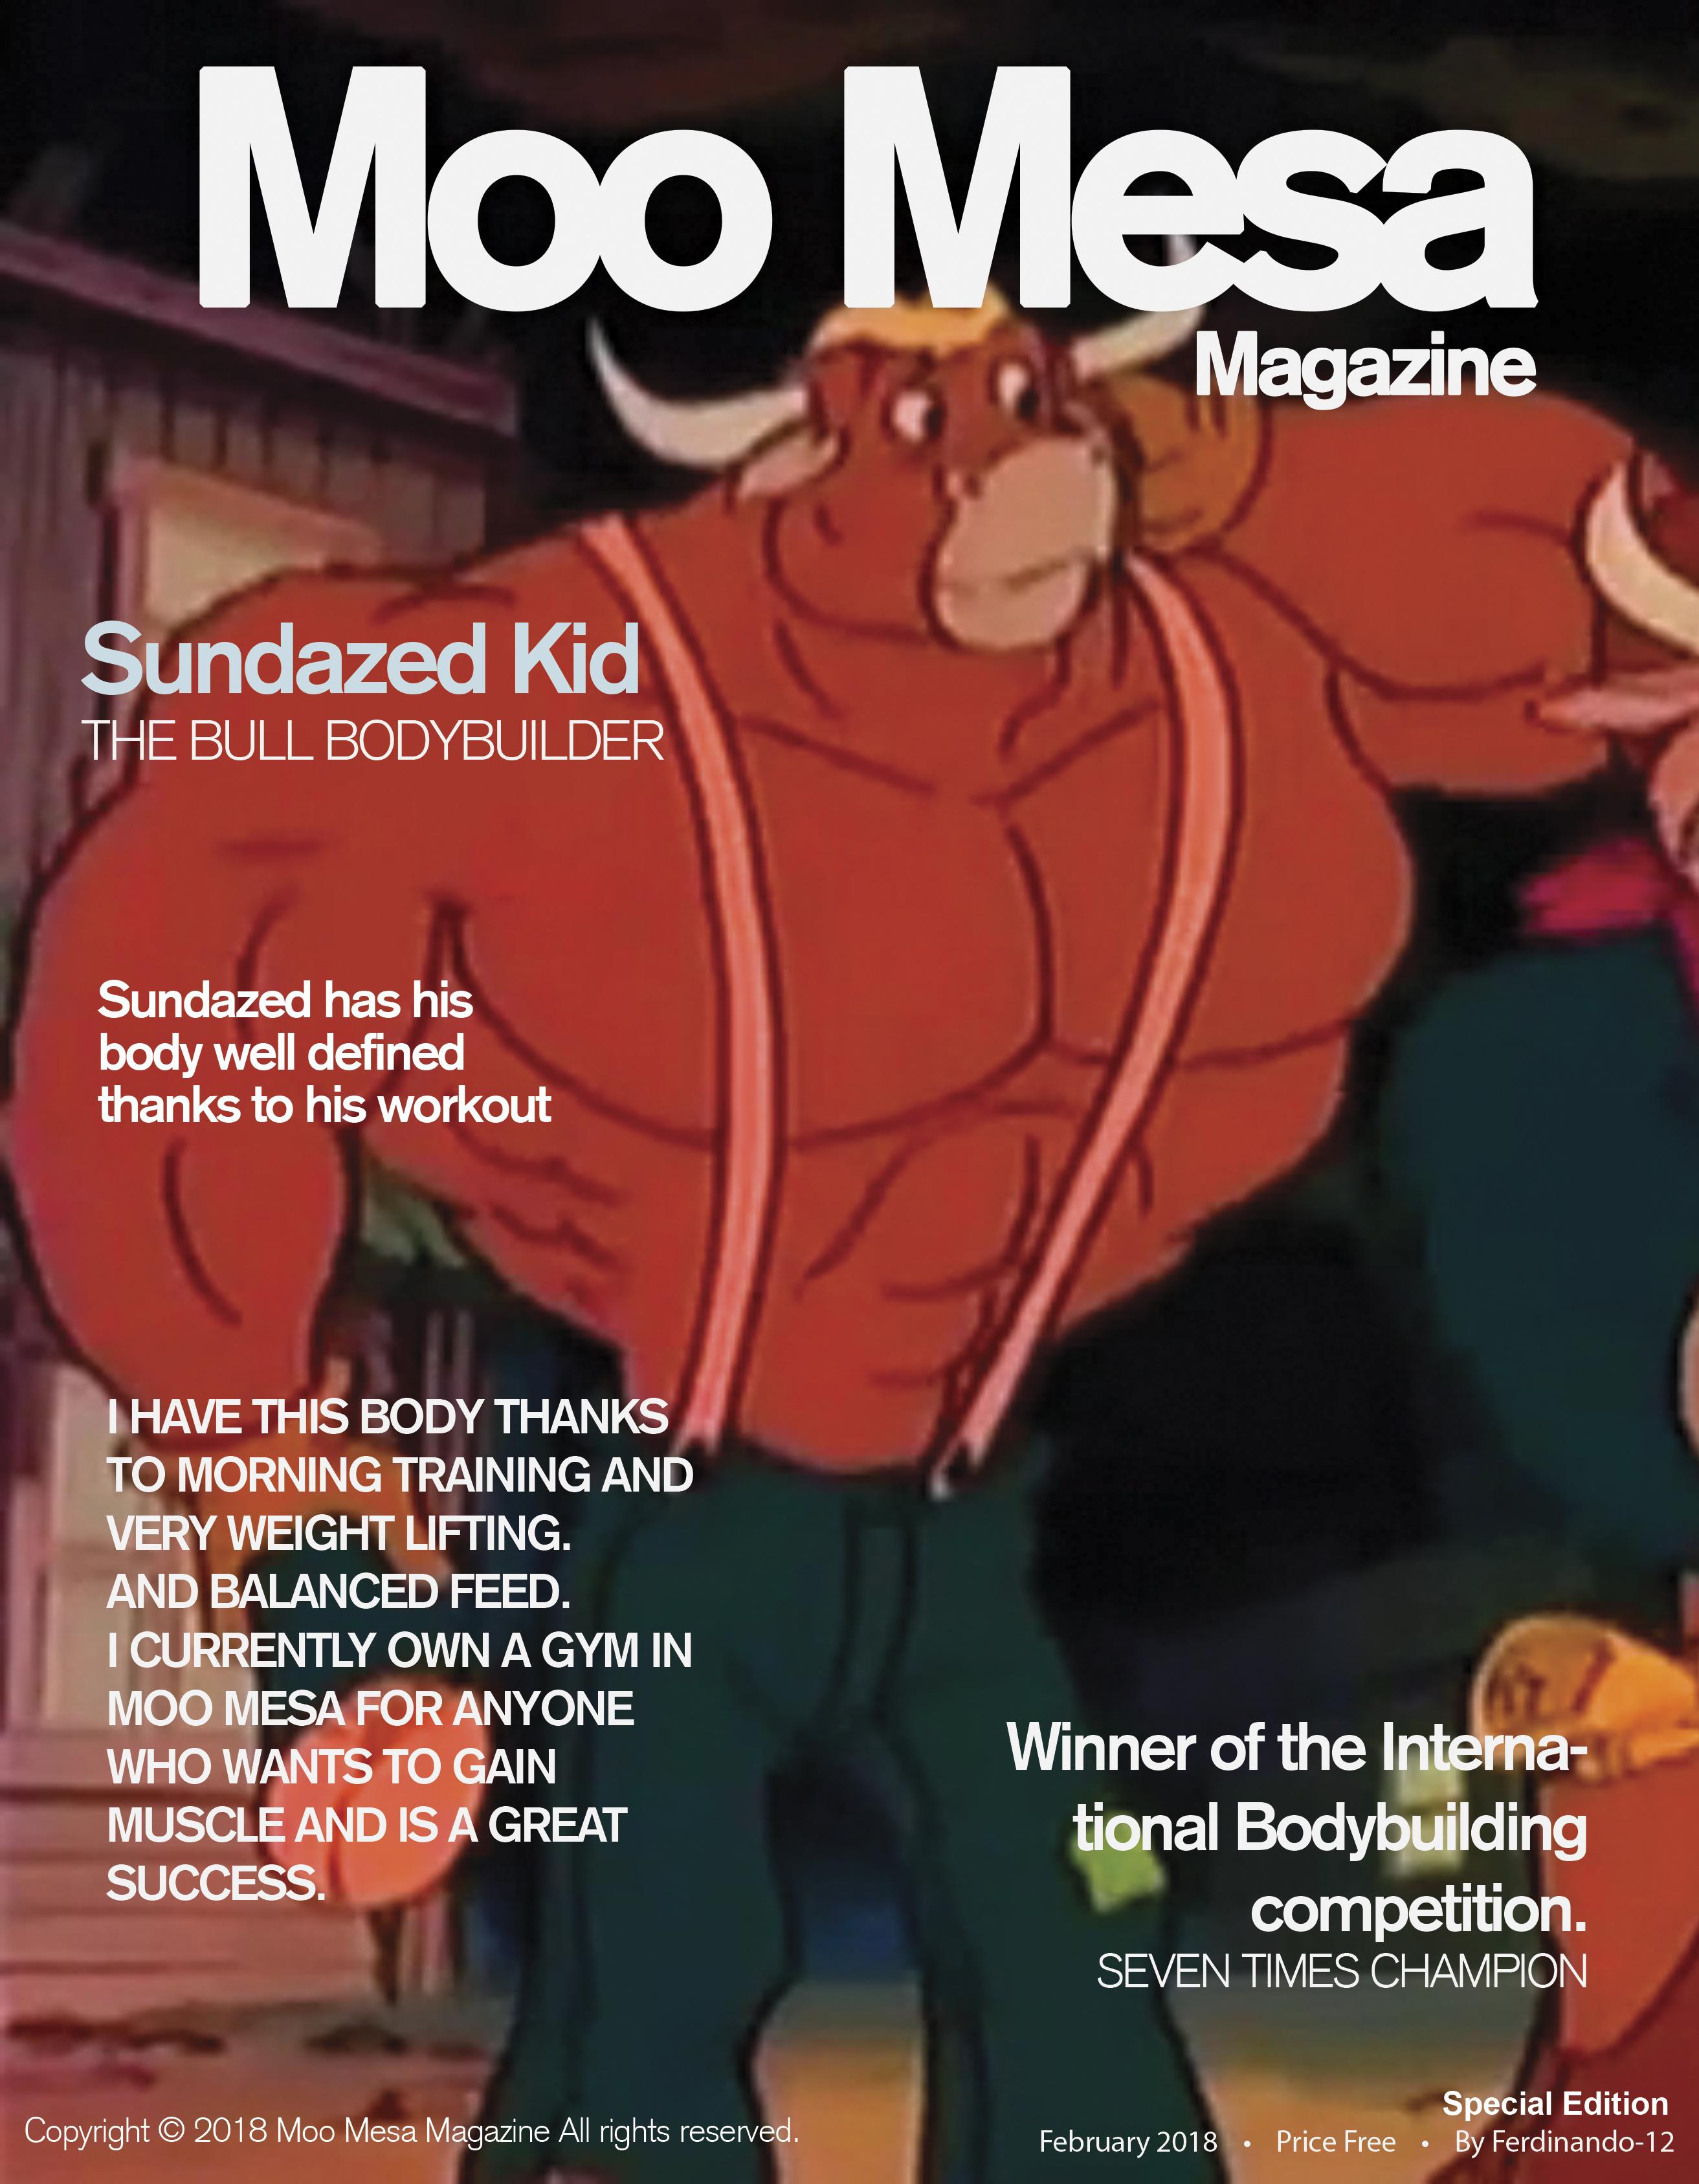 Moo Mesa Magazine #1: Sundazed Kid by CCB-18